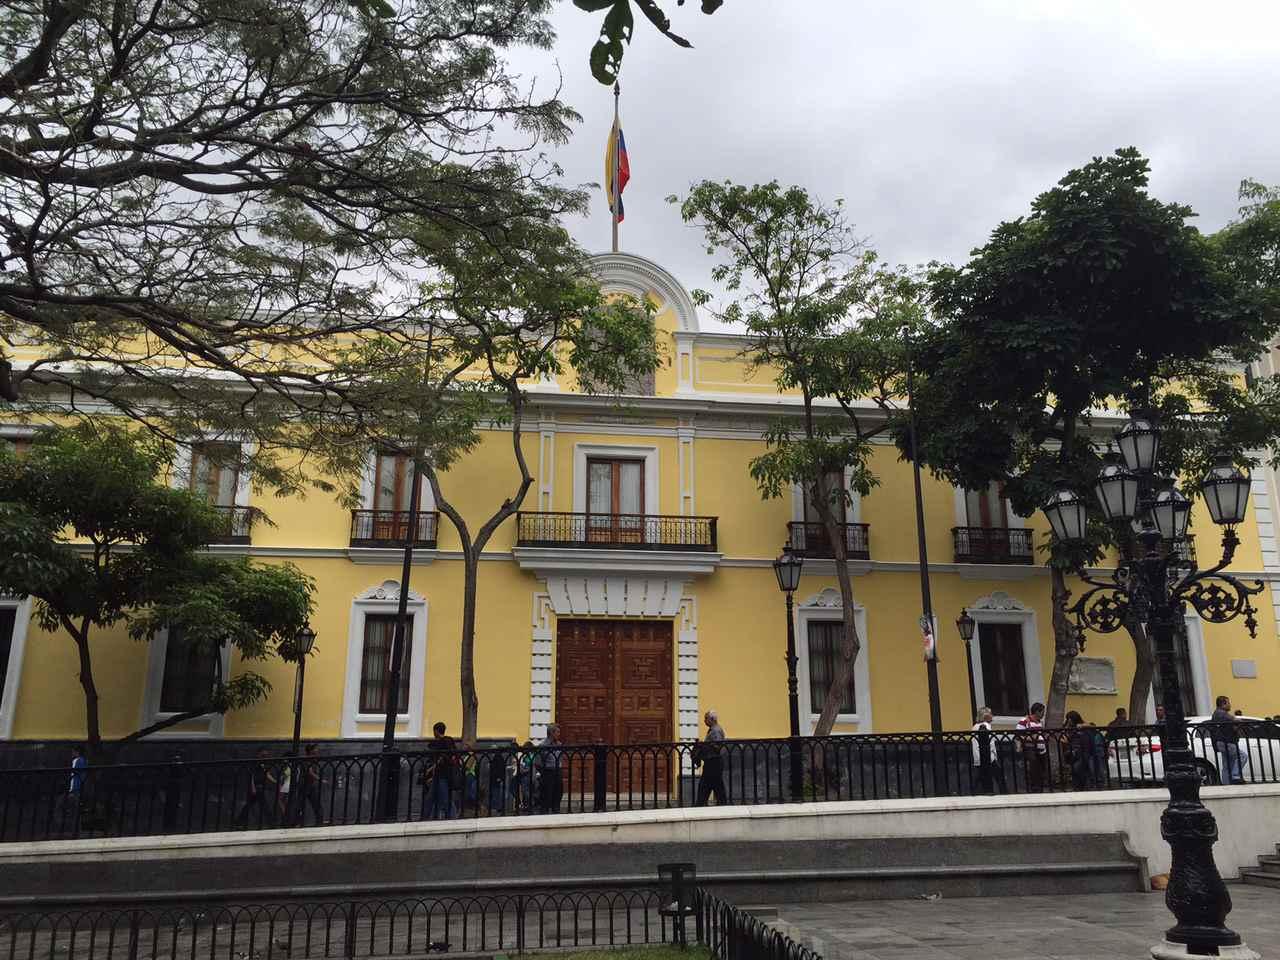 Casa Amarilla, Caracas, Venezuela